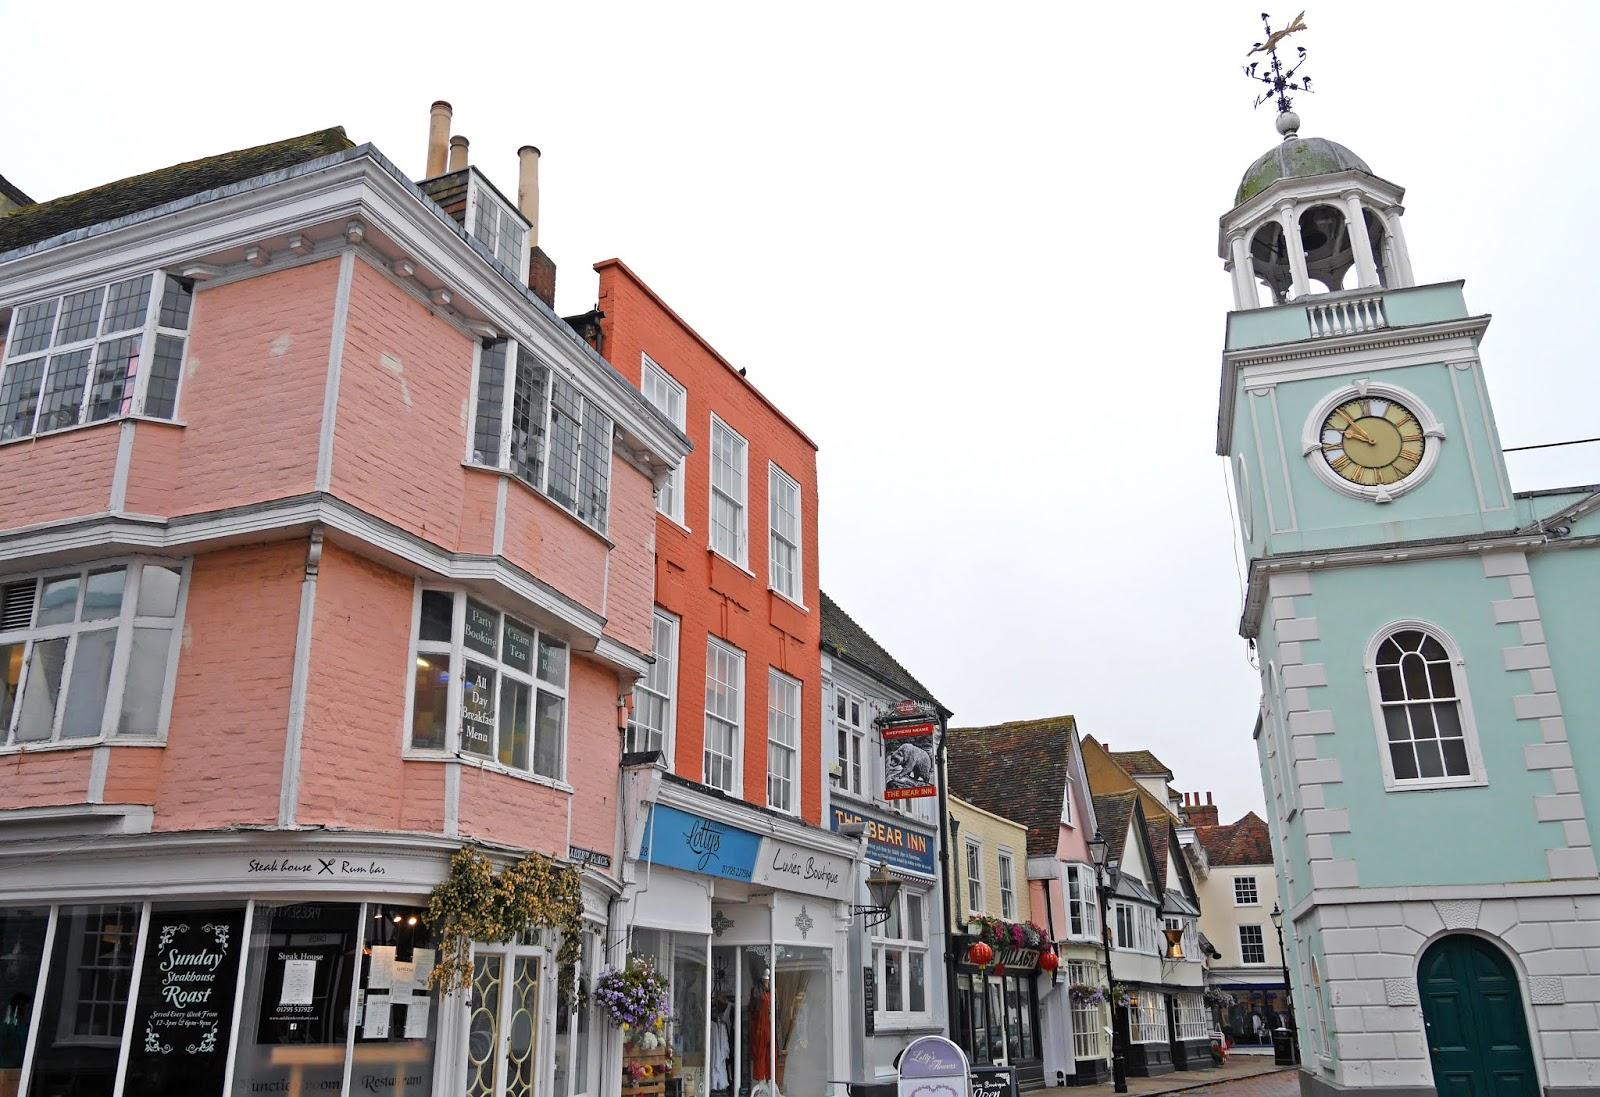 Faversham market place, Kent